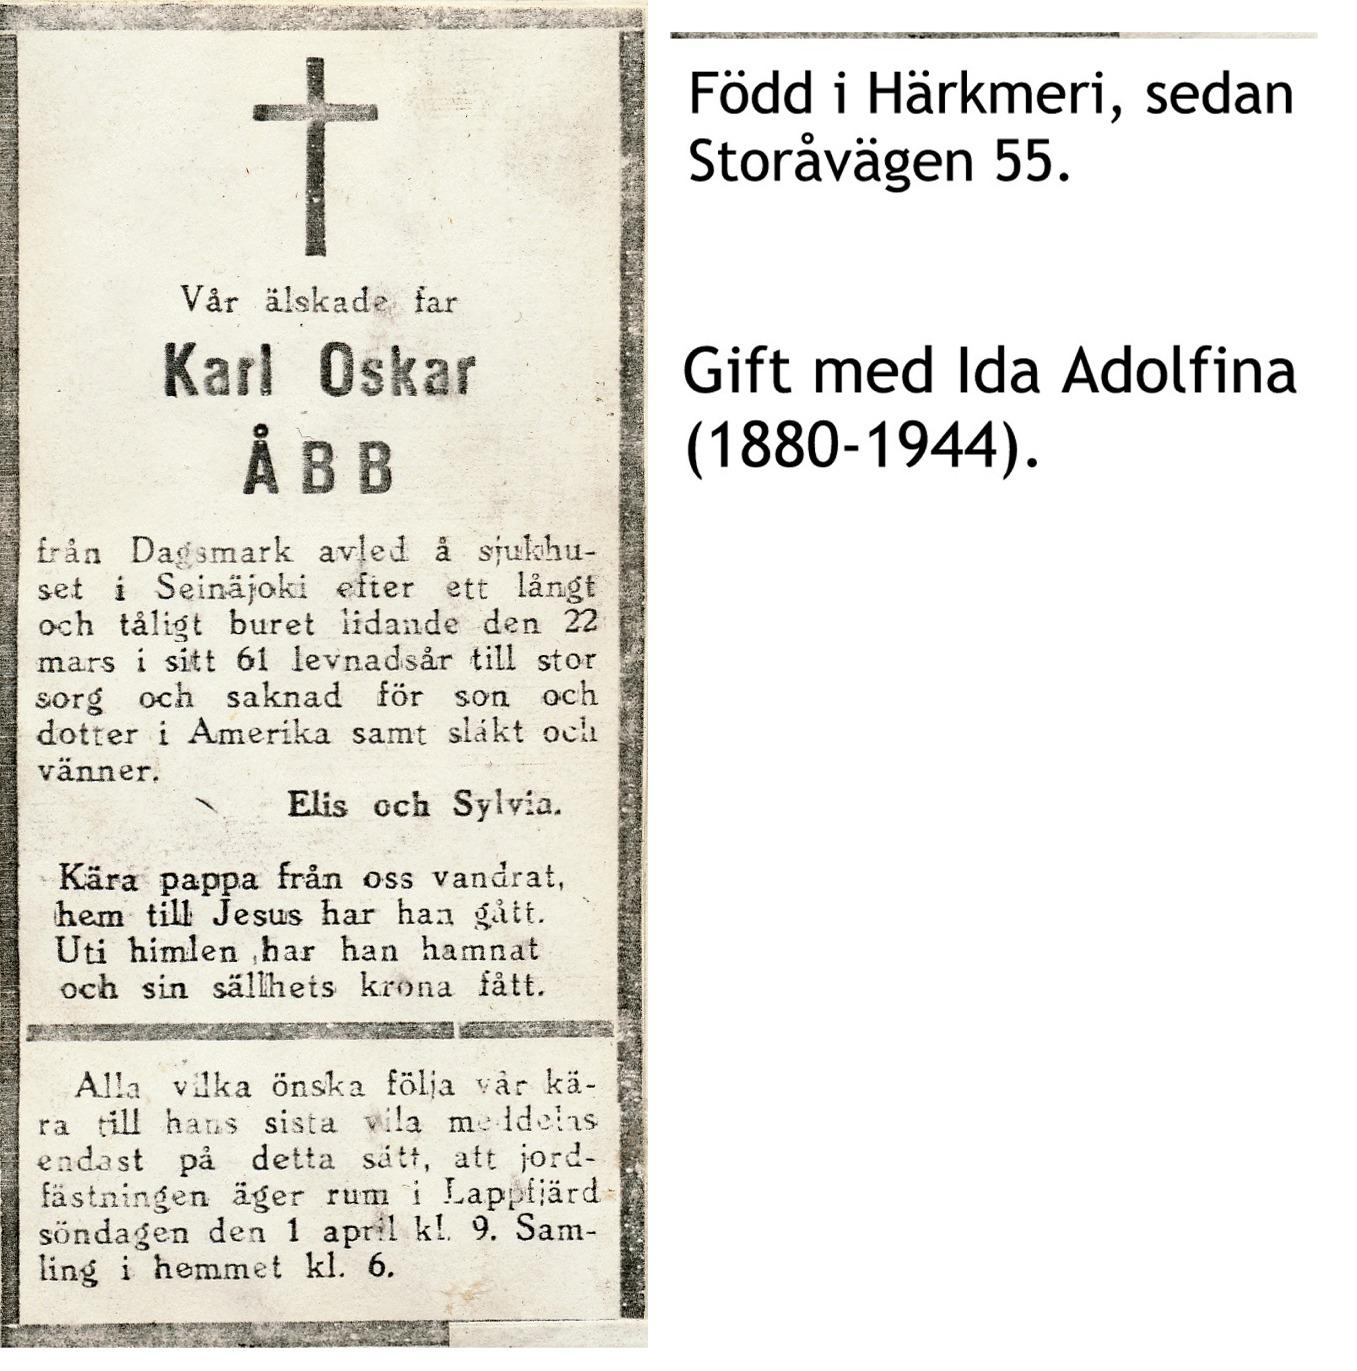 Åbb Oskar